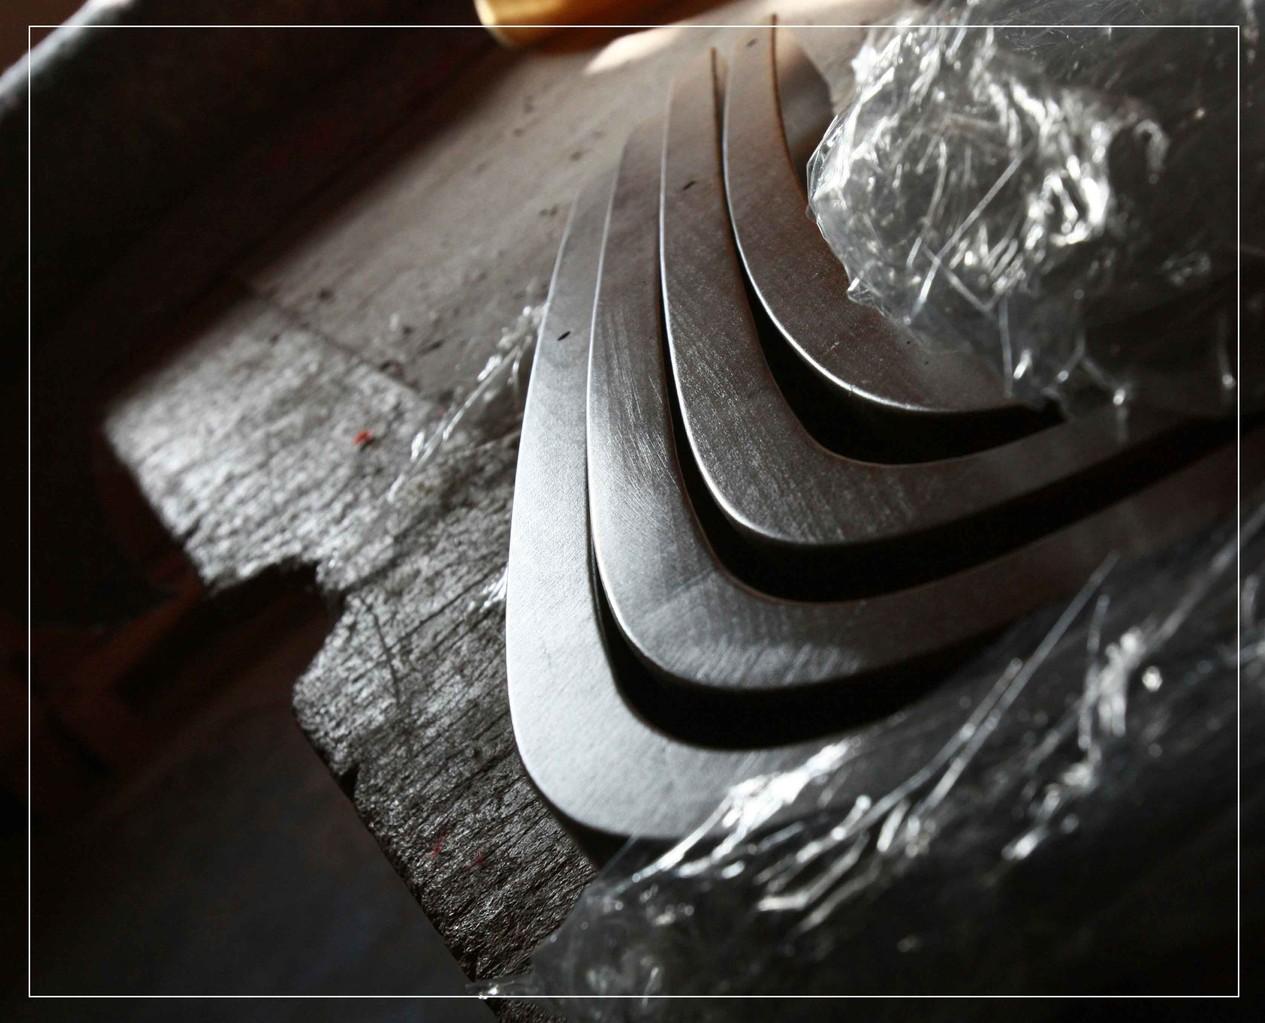 Brazos de madera - EntreSofas - Sofas Valladolid